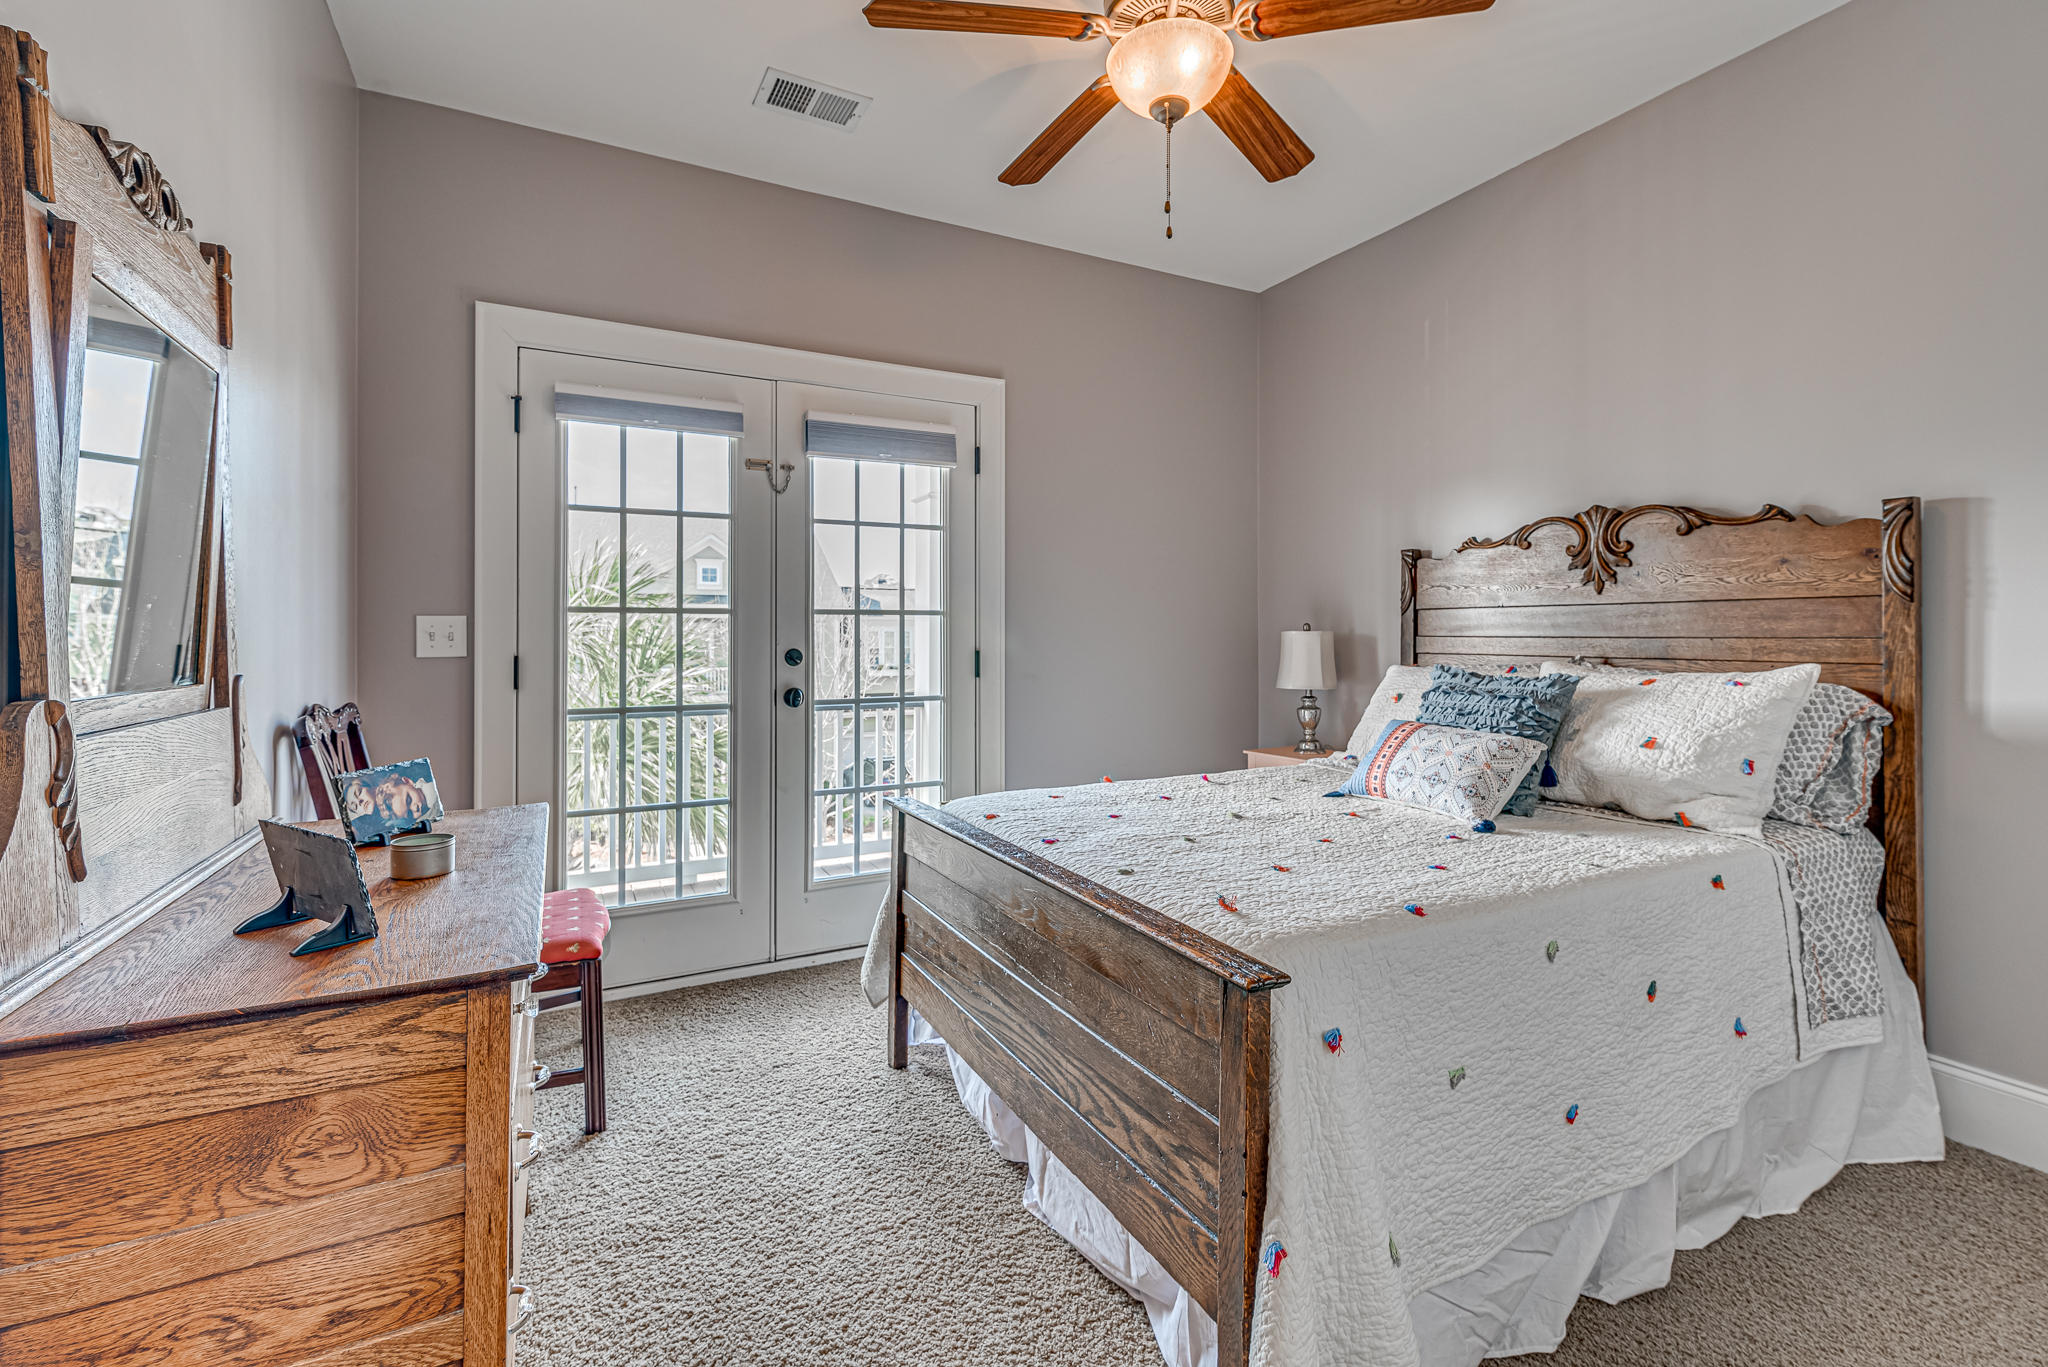 Daniel Island Smythe Park Homes For Sale - 1410 Wando View, Charleston, SC - 53